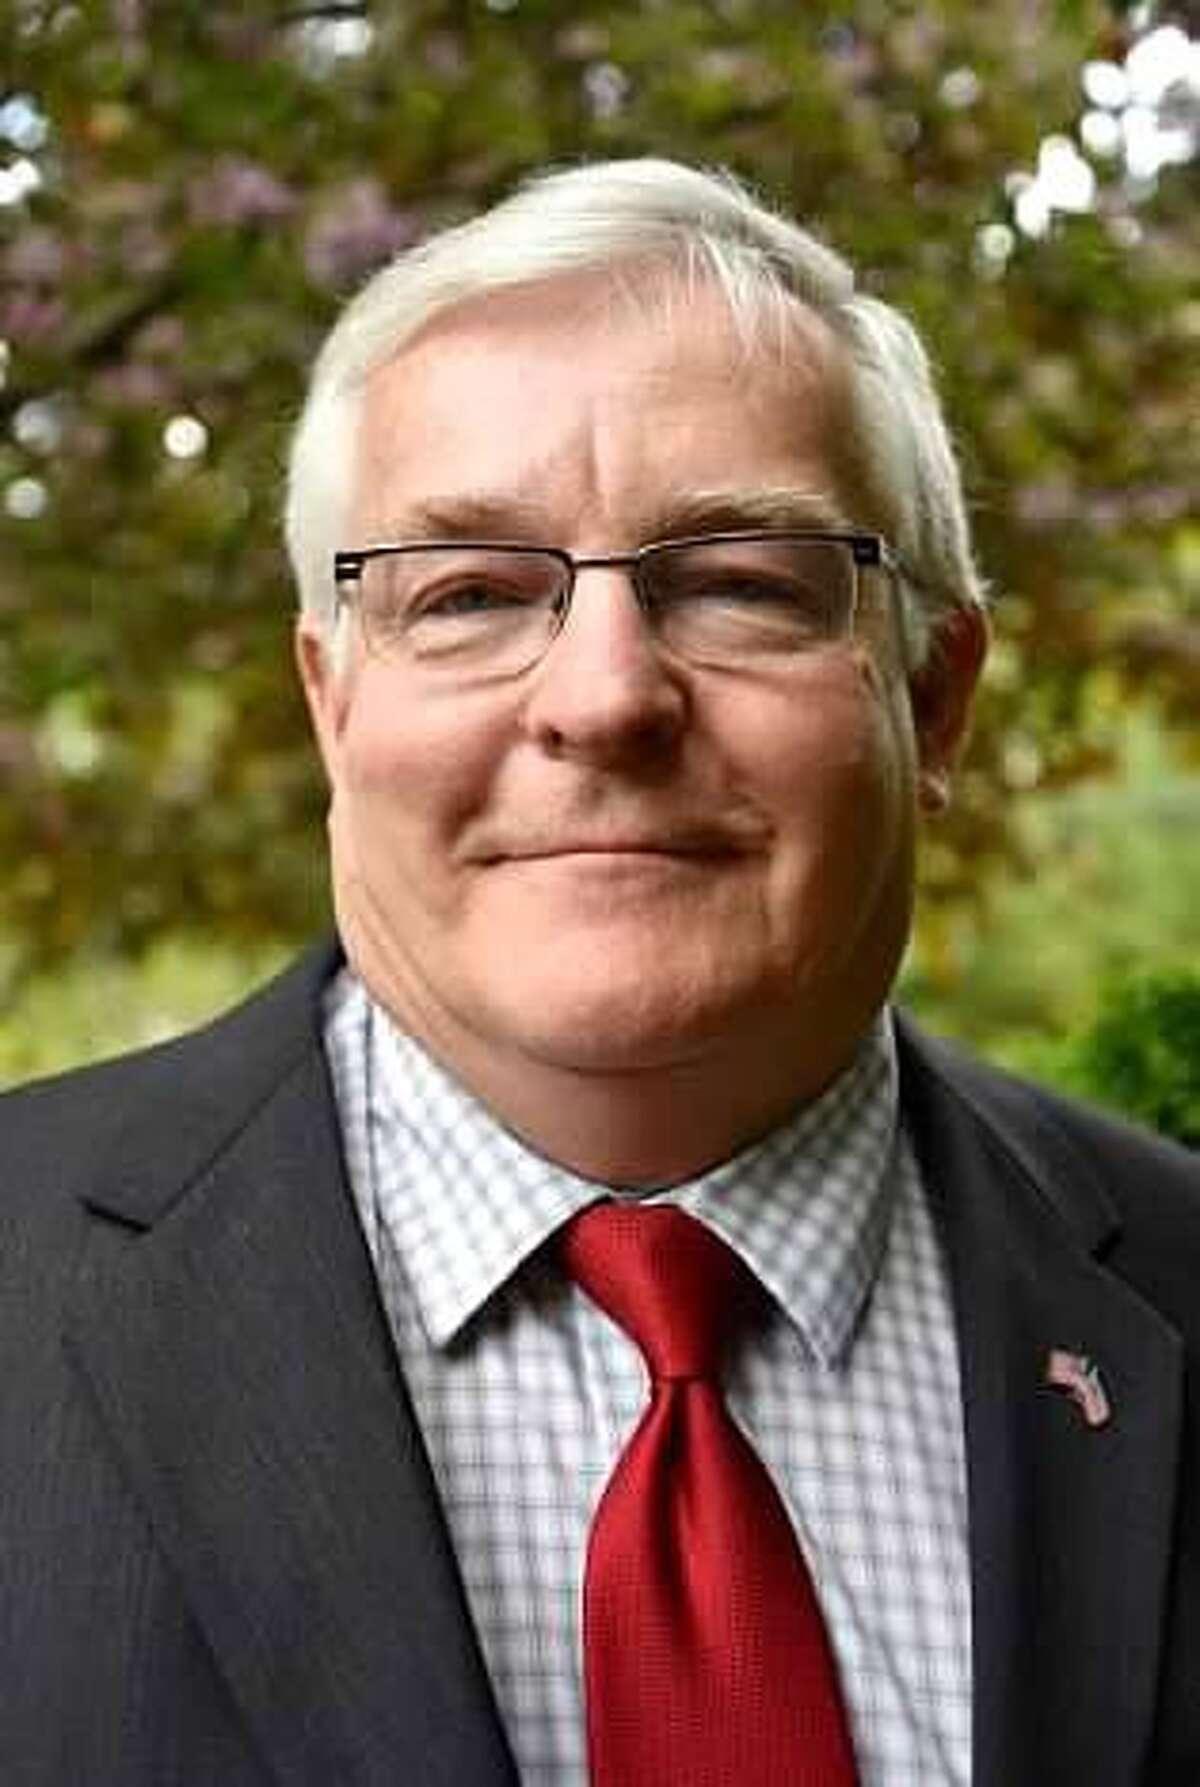 Craig Warner